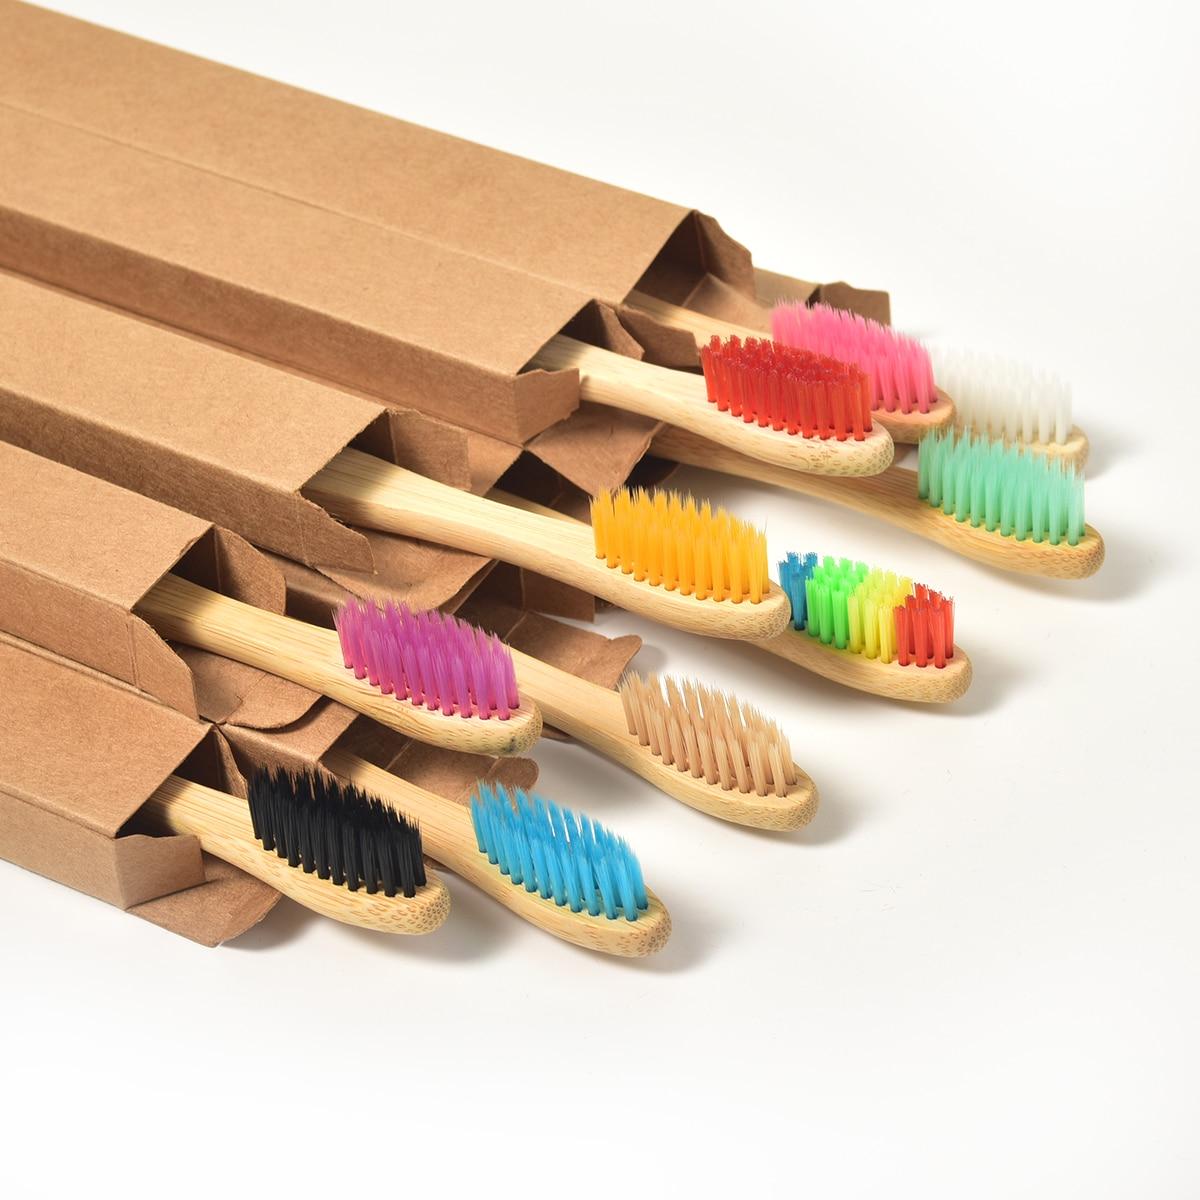 Biodegradable Bamboo Toothbrush Bamboo & Eco Friendly Toothbrushes » Planet Green Eco-Friendly Shop